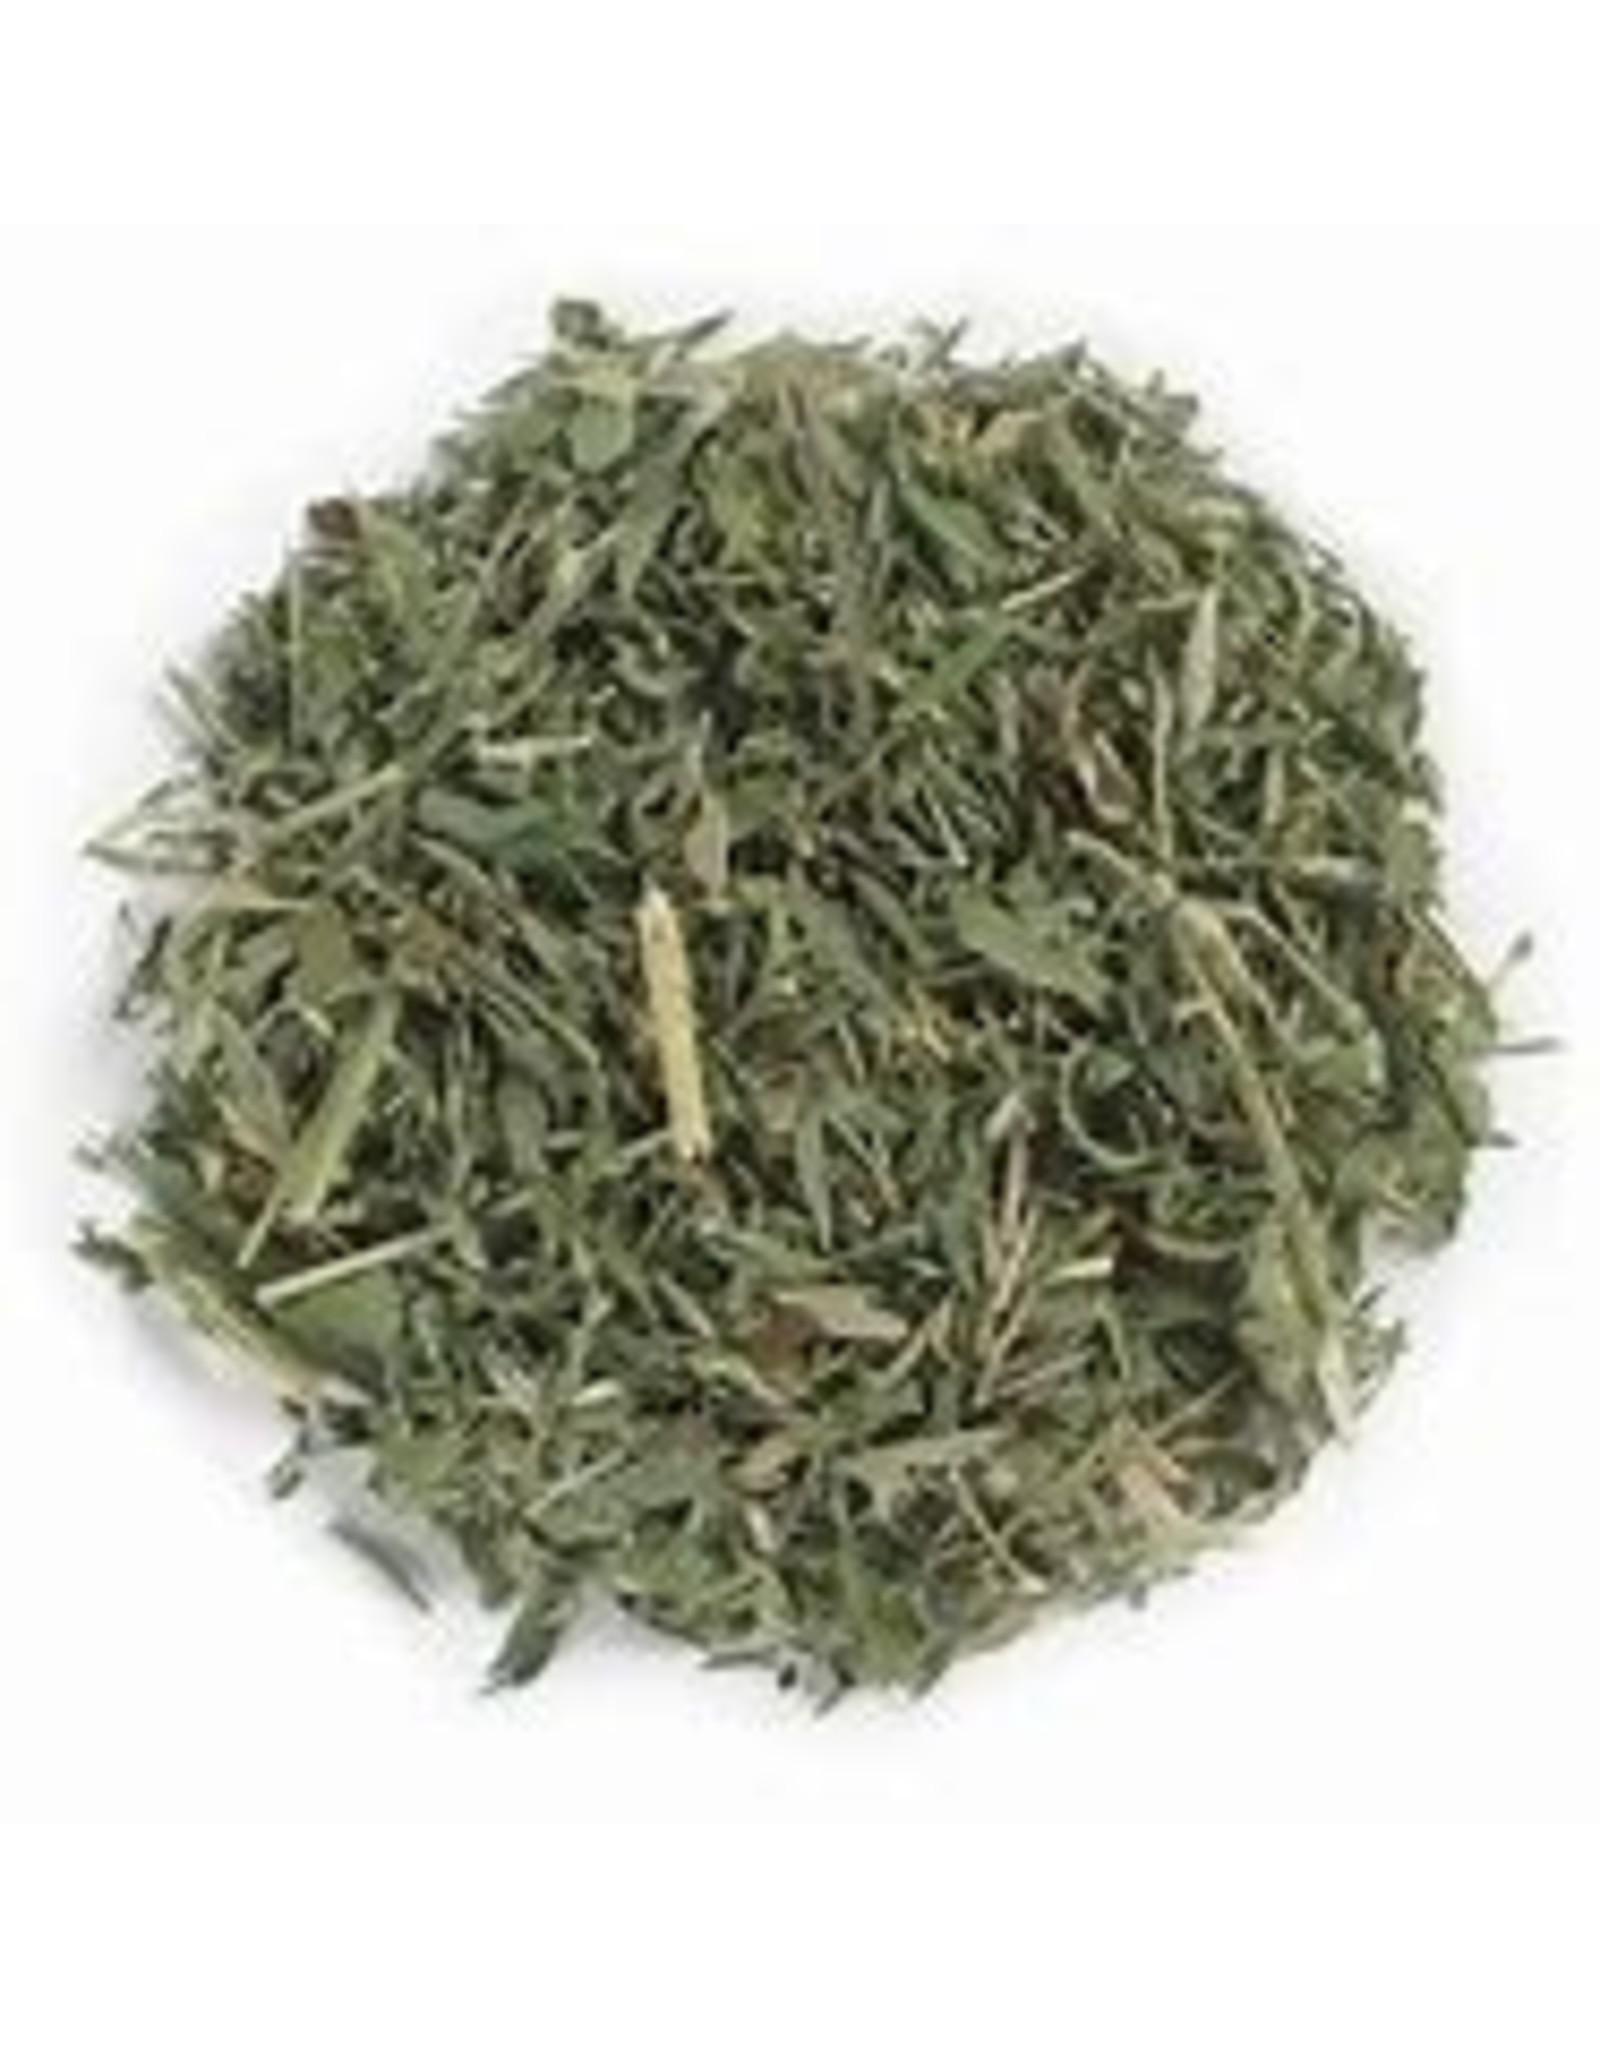 Alfalfa Leaf herb 1 oz